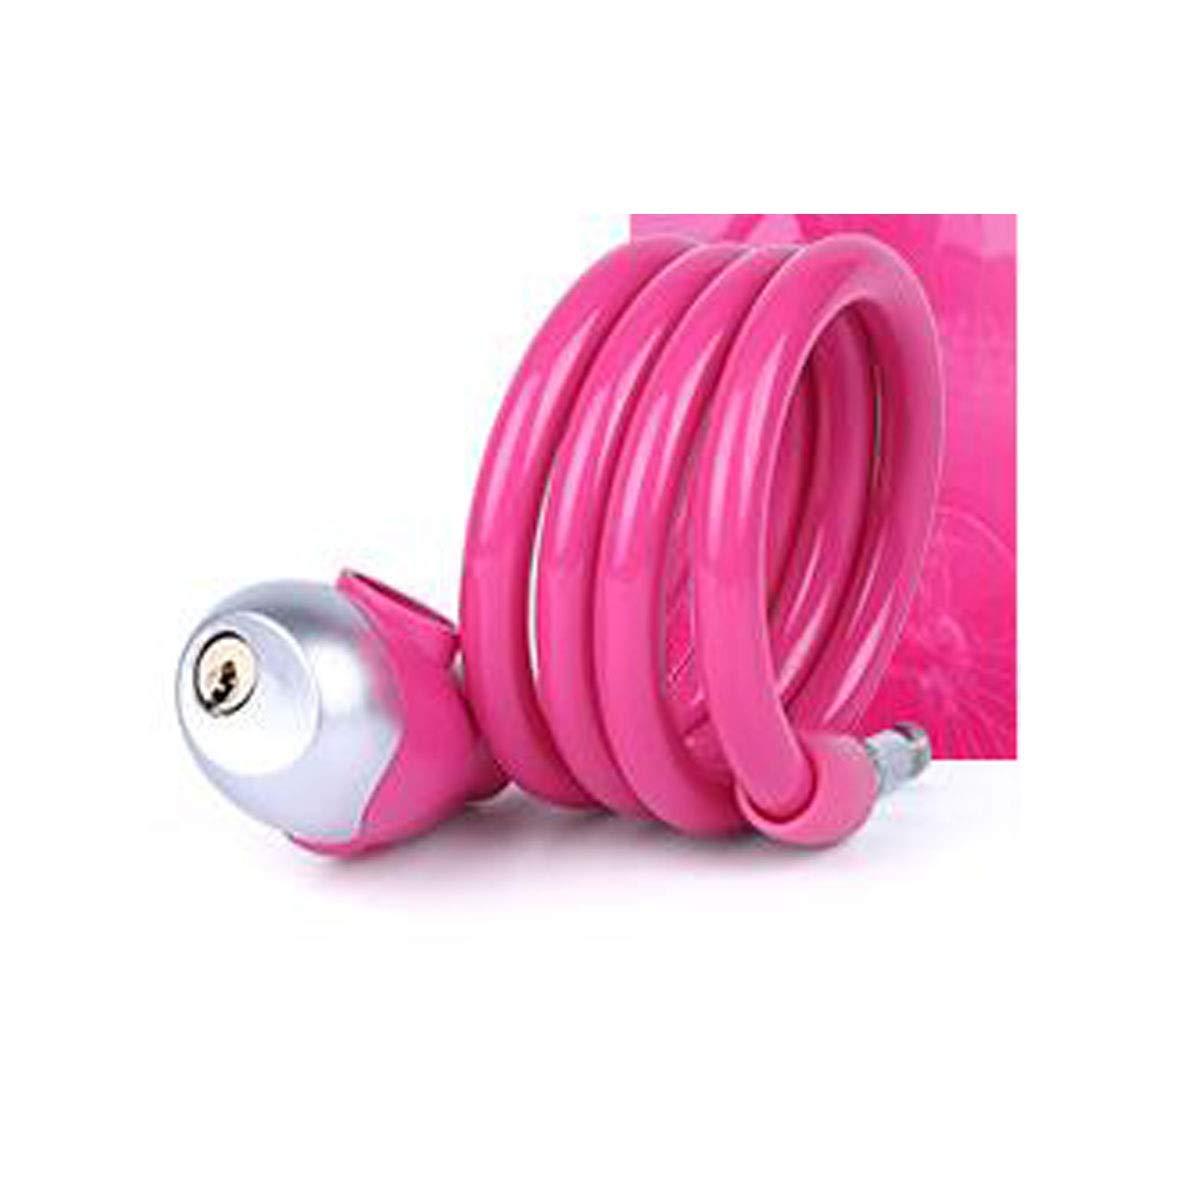 8haowenju ノベルデザインロック - ケーブルロック 軽量 自転車チェーンロック サイズ: 46インチ (長さ) 0.44インチ (直径) (カラー: ピンク) B07QLJ9H7Z